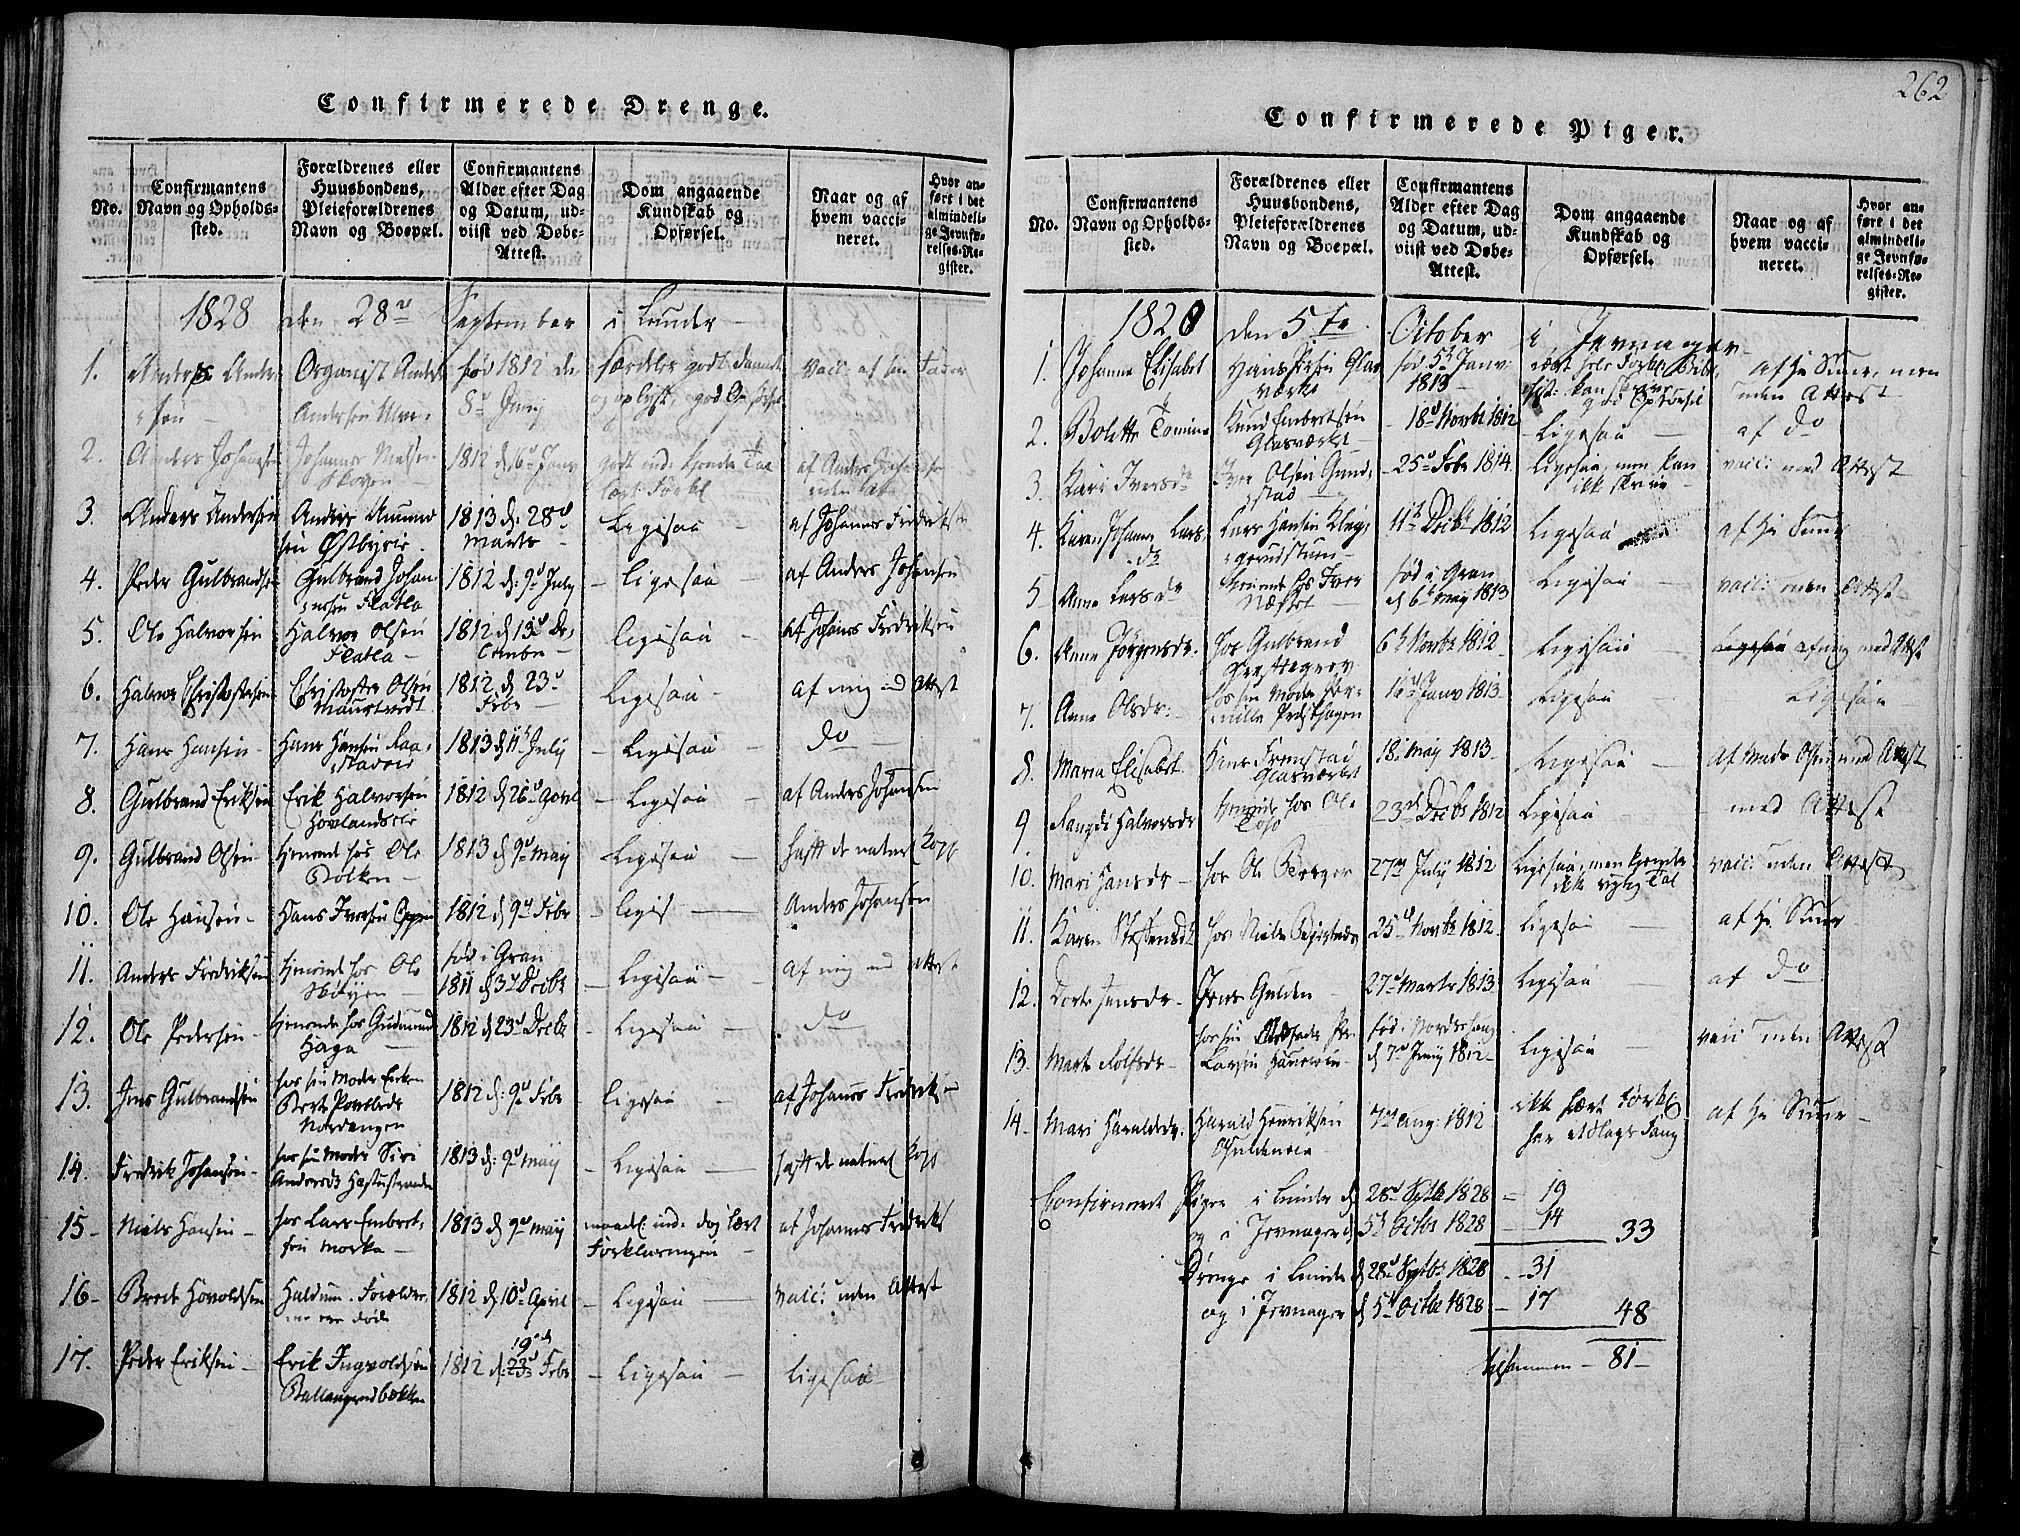 SAH, Jevnaker prestekontor, Ministerialbok nr. 5, 1815-1837, s. 262